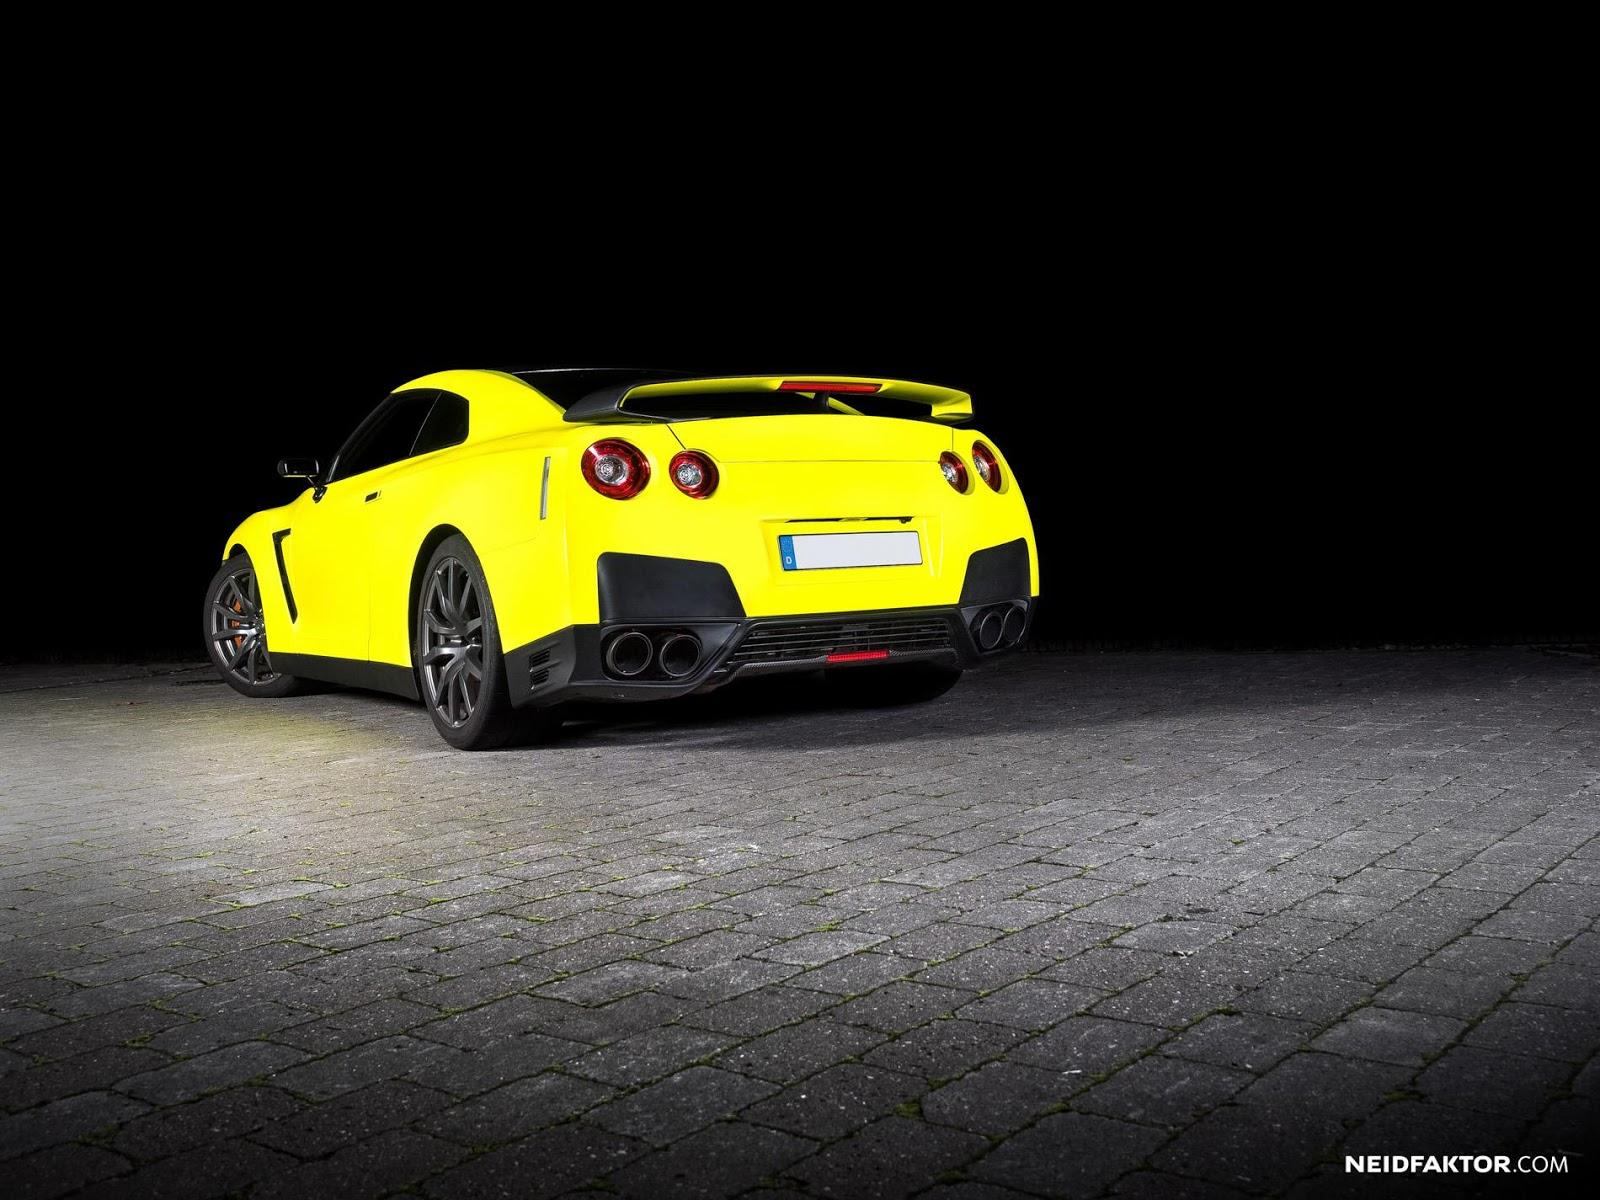 Nissan_GT-R_Neidfaktor_0000